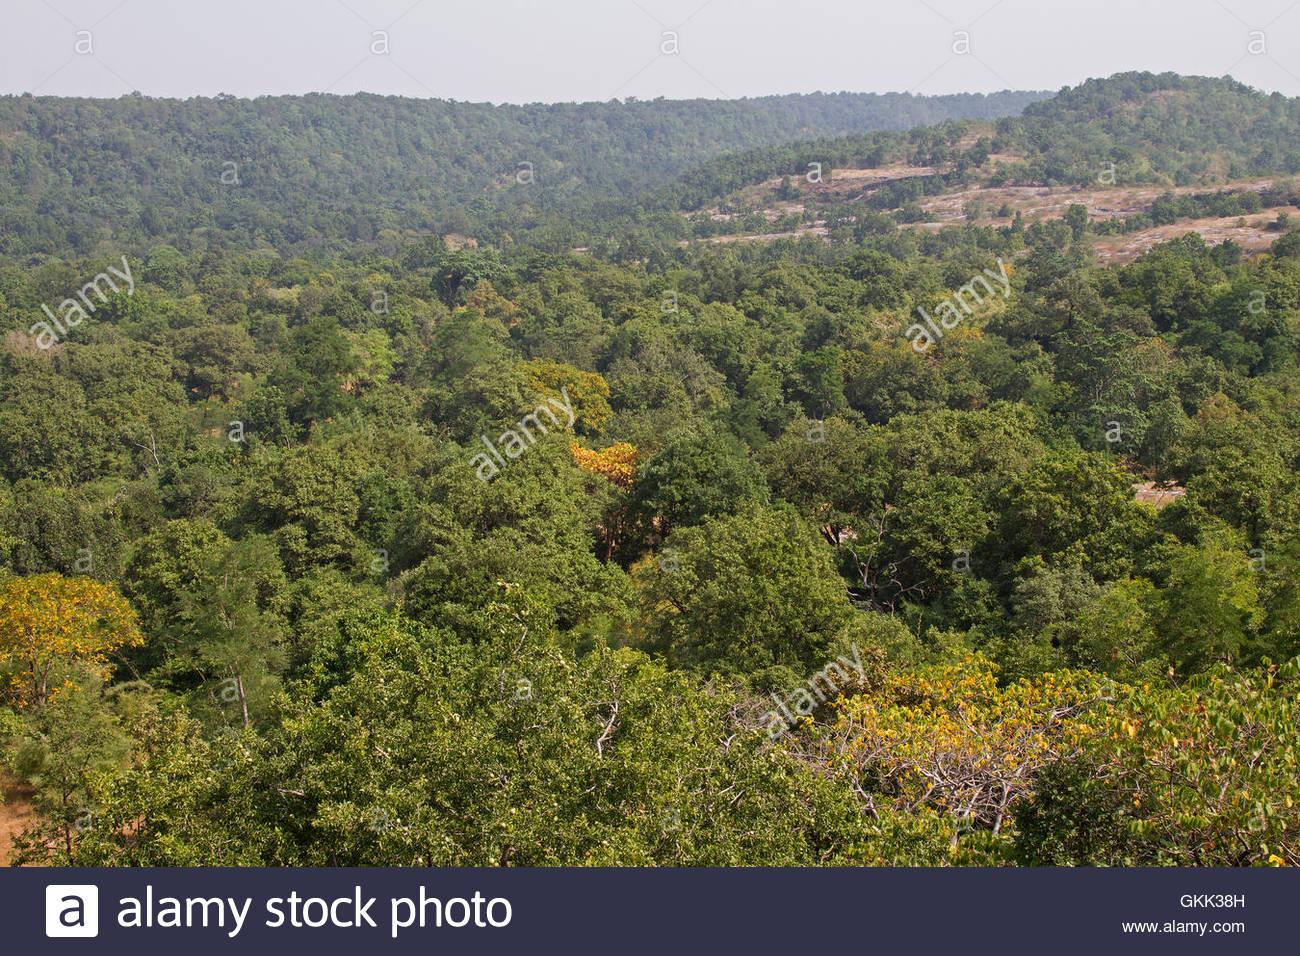 Bandhavgarh National Park, India, jungle scene, forest scene, tiger reserve, bengal tigers - Stock Image